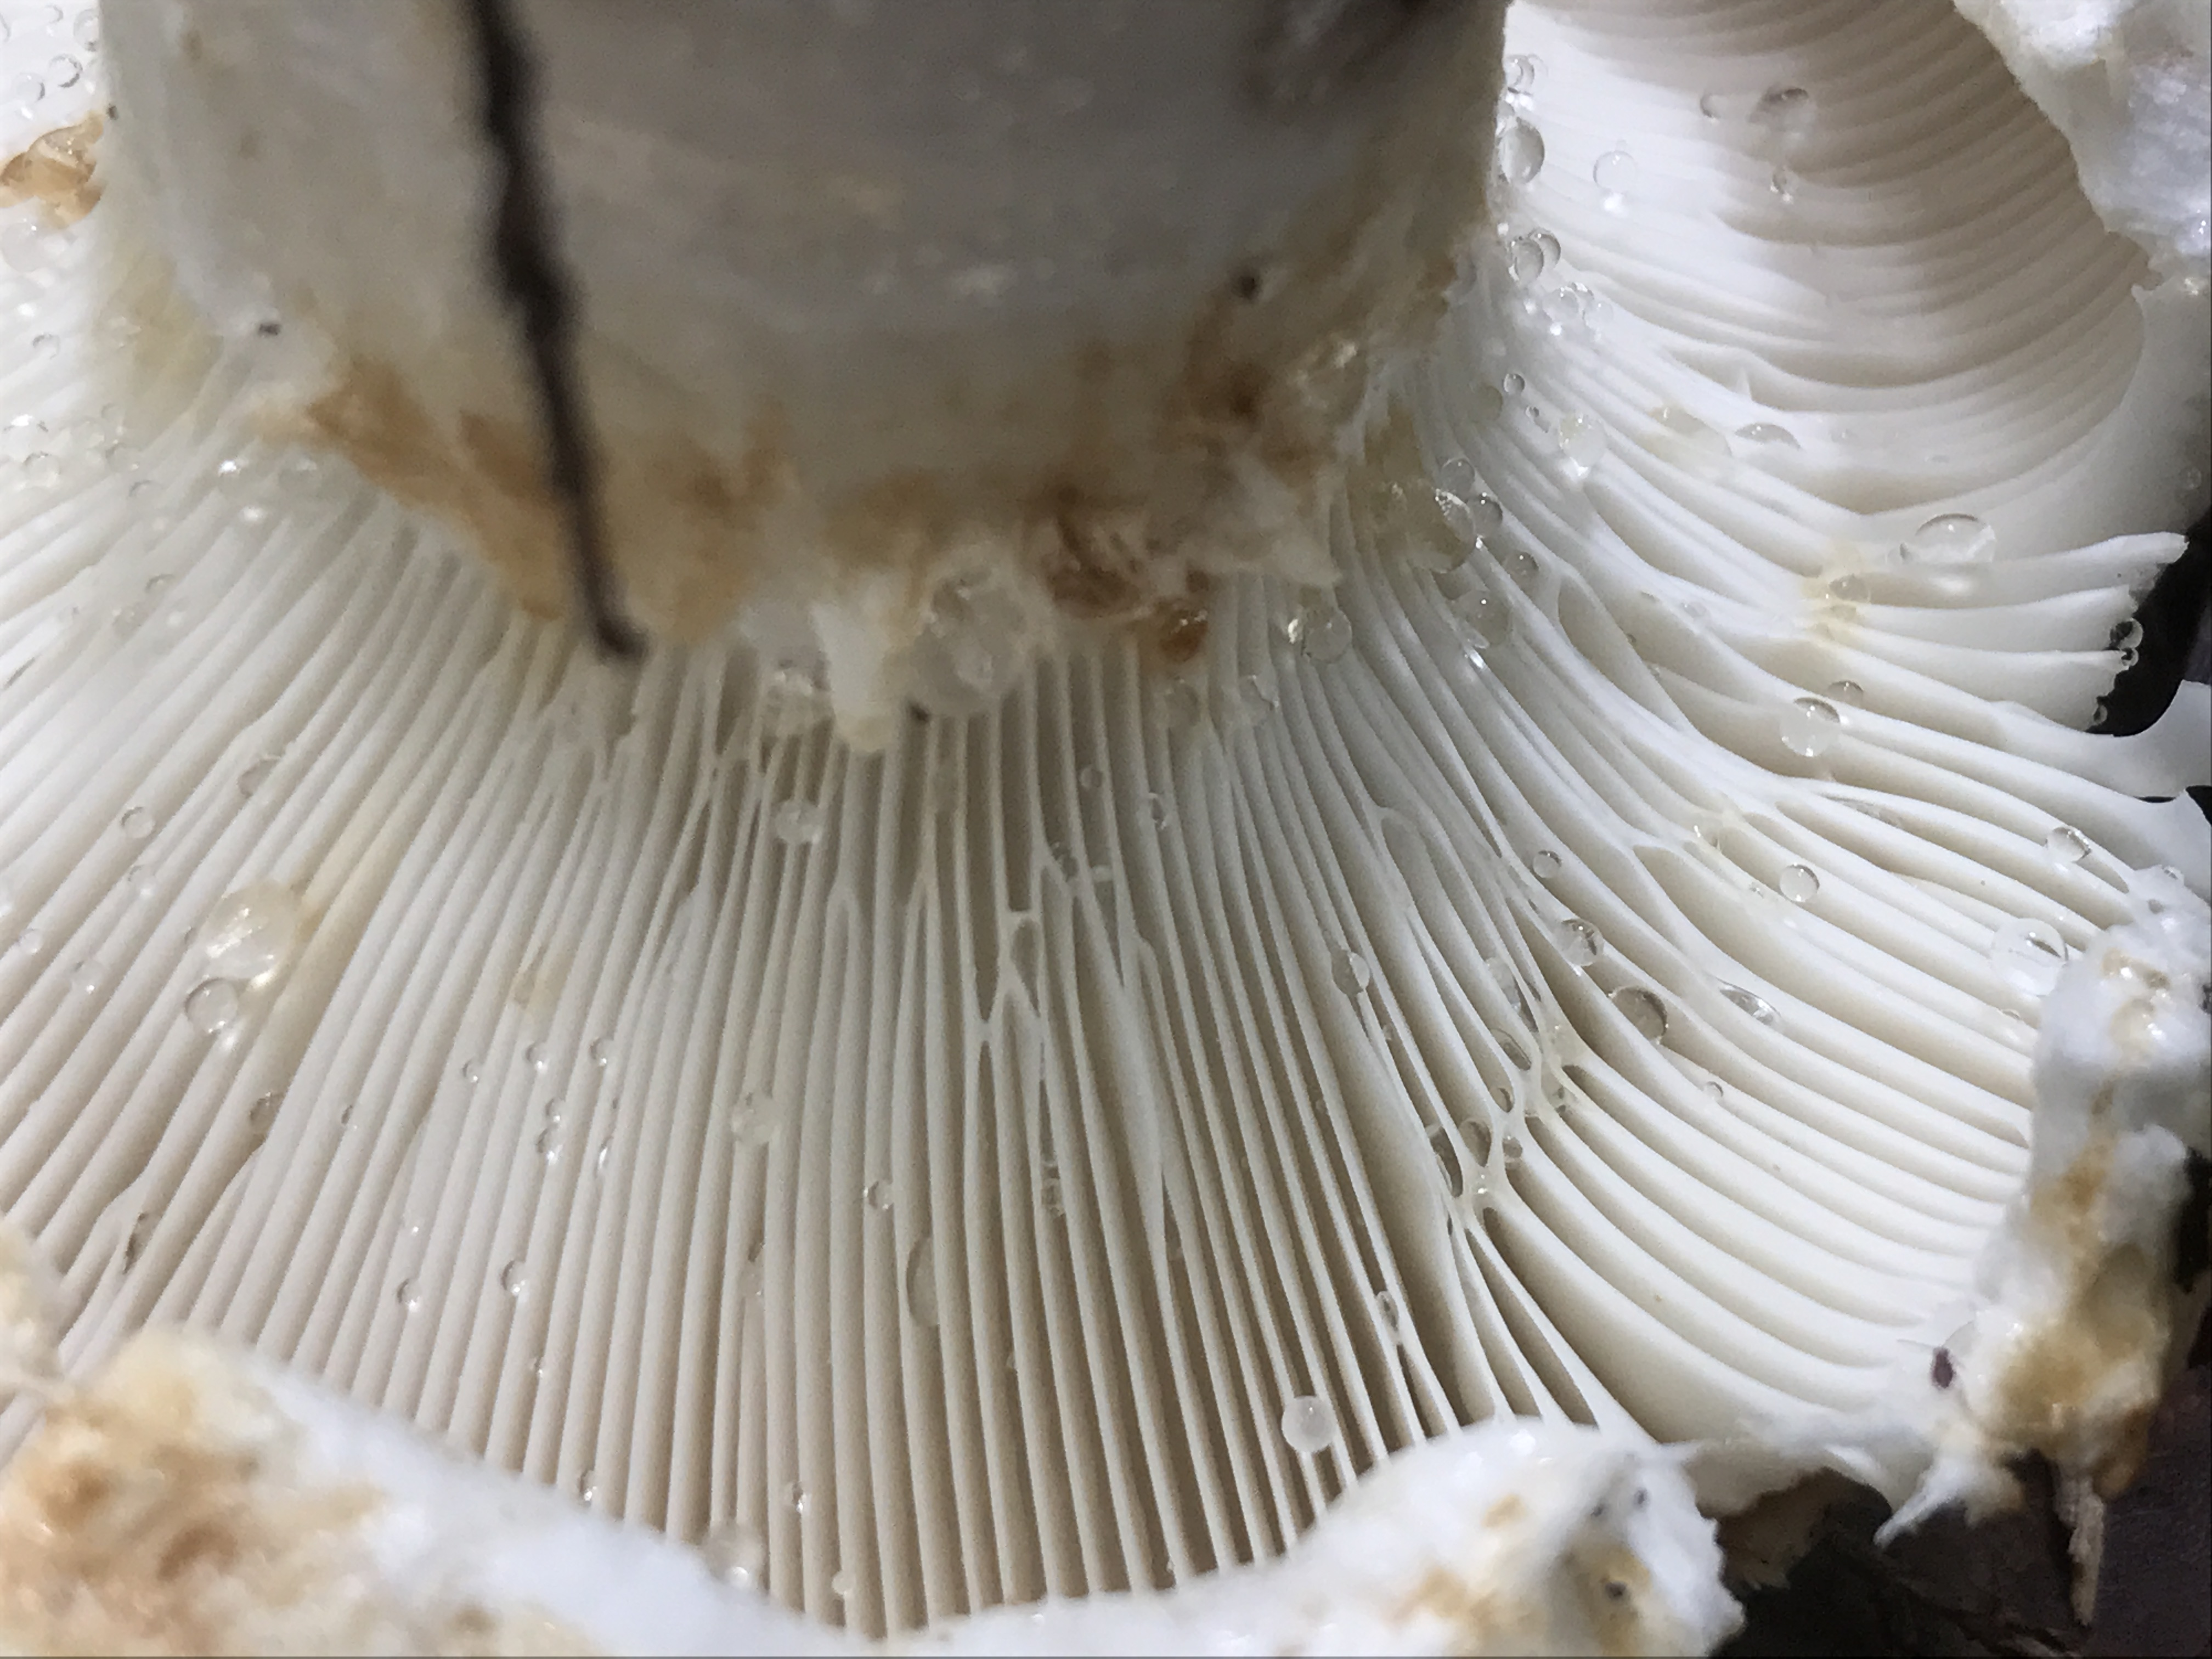 Lactifluus deceptivus image